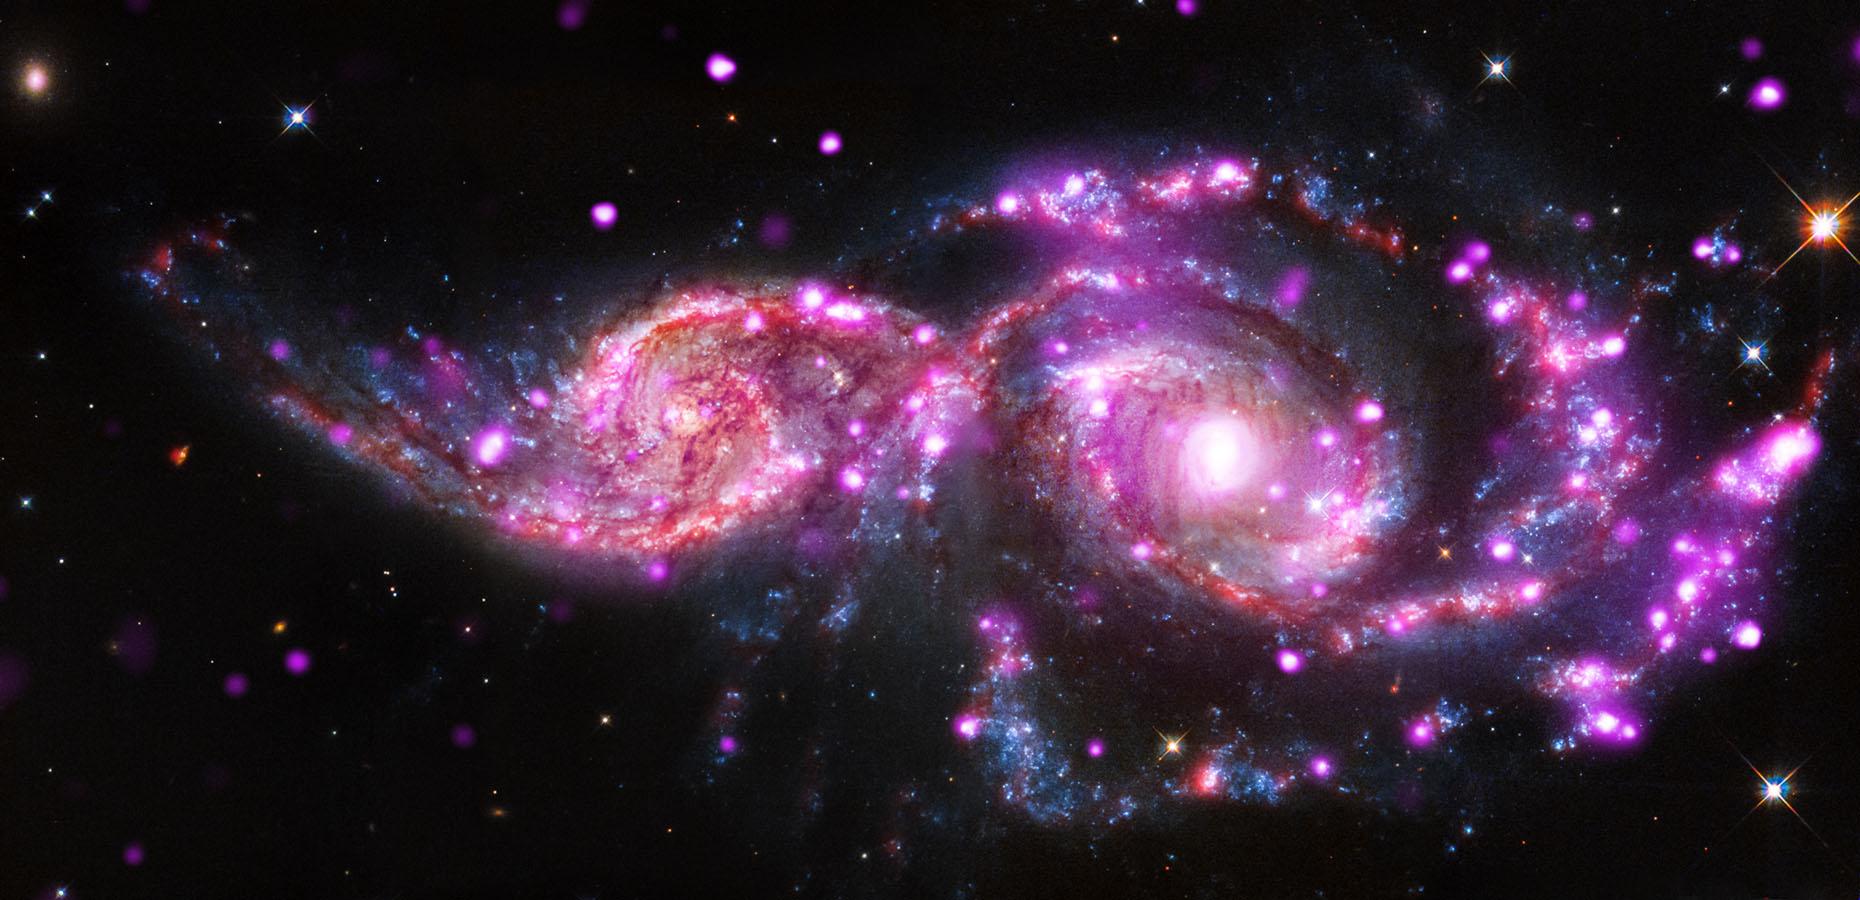 Image credit: NASA/CXC/SAO/STScI/JPL-Caltech